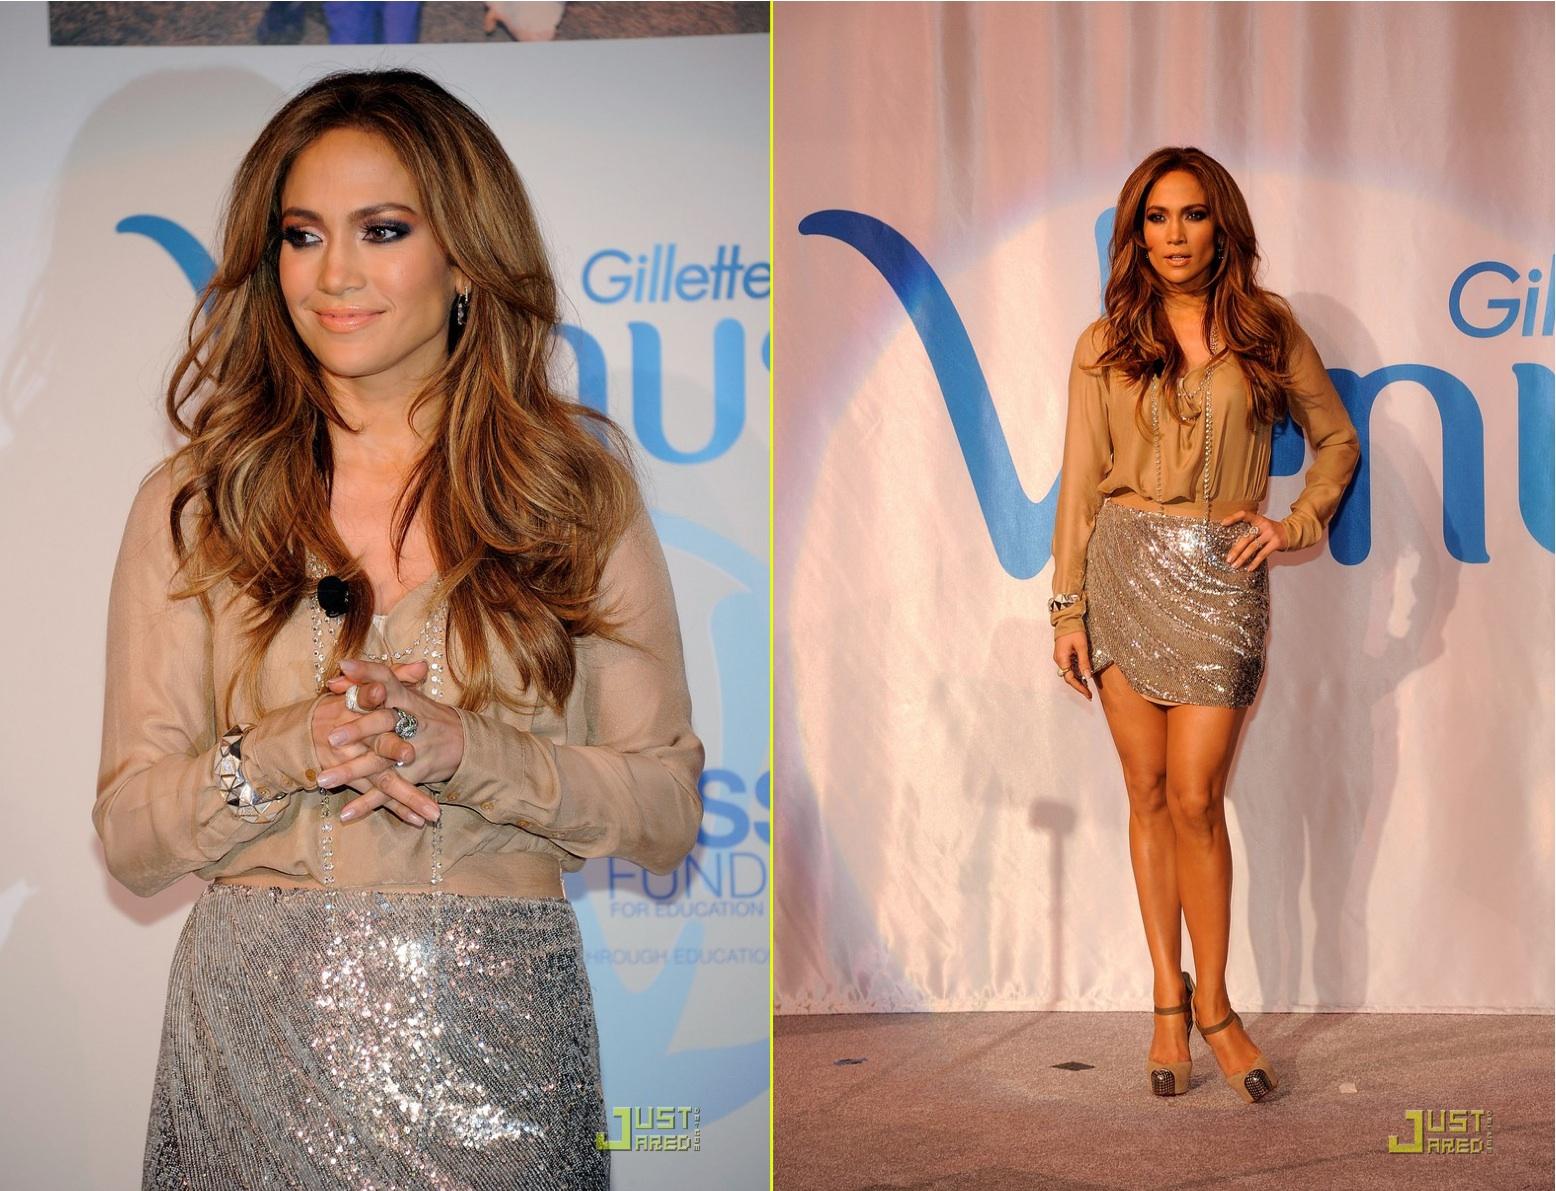 http://2.bp.blogspot.com/_PfmV3qvy8FY/TUonKXSp1WI/AAAAAAAABhw/3LV-3bptBXE/s1600/la+modella+mafia+Jennifer+Lopez+via+justjared+1.jpg